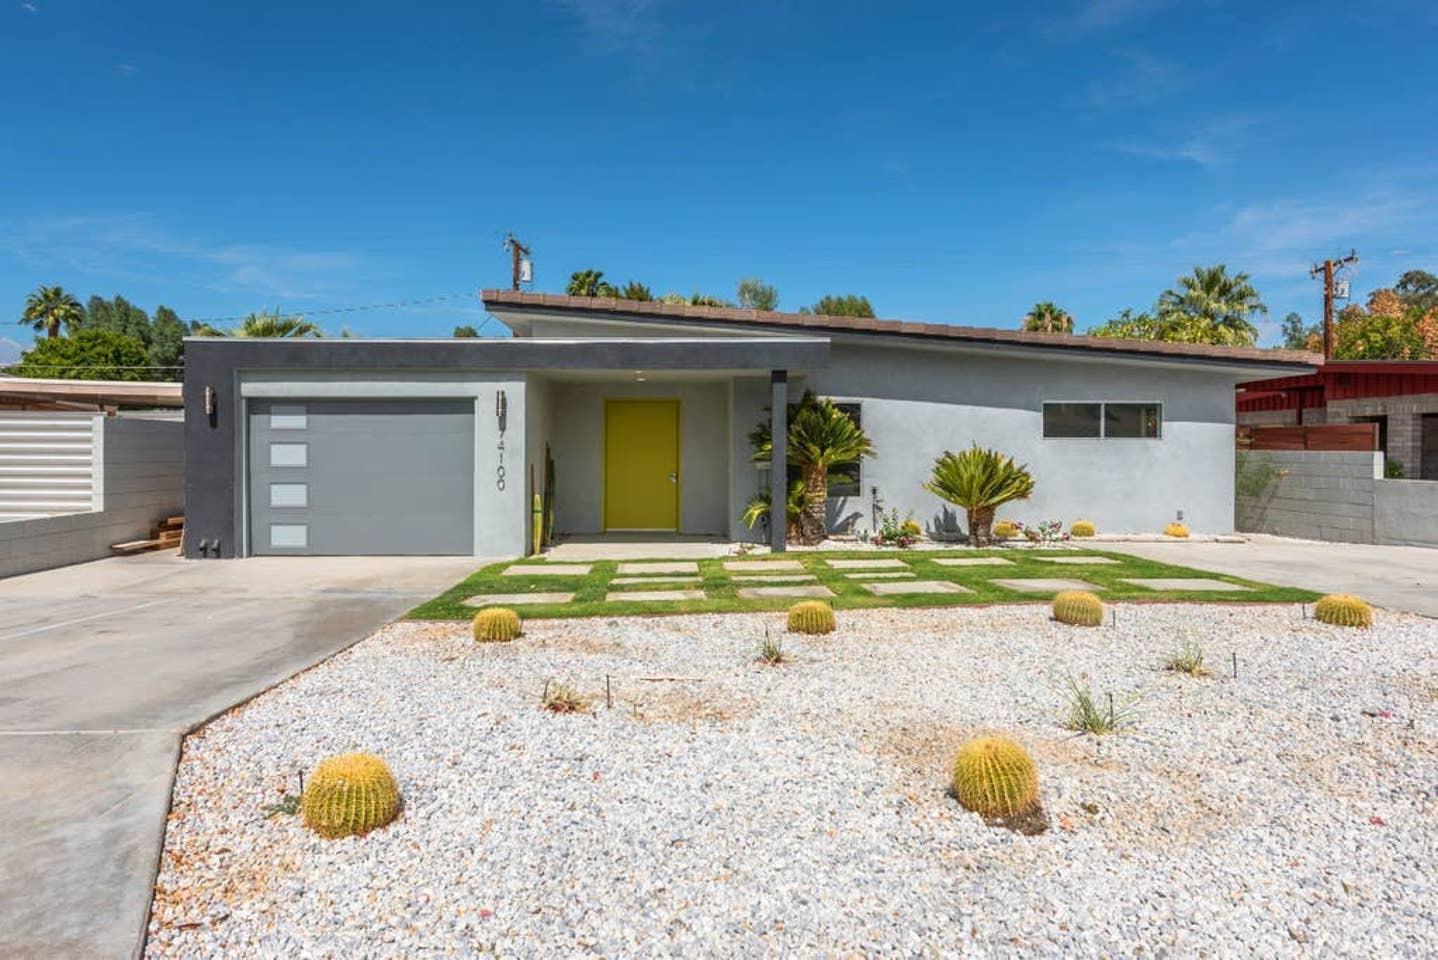 Photo of 74100 El Cortez Way, Palm Desert, CA 92260